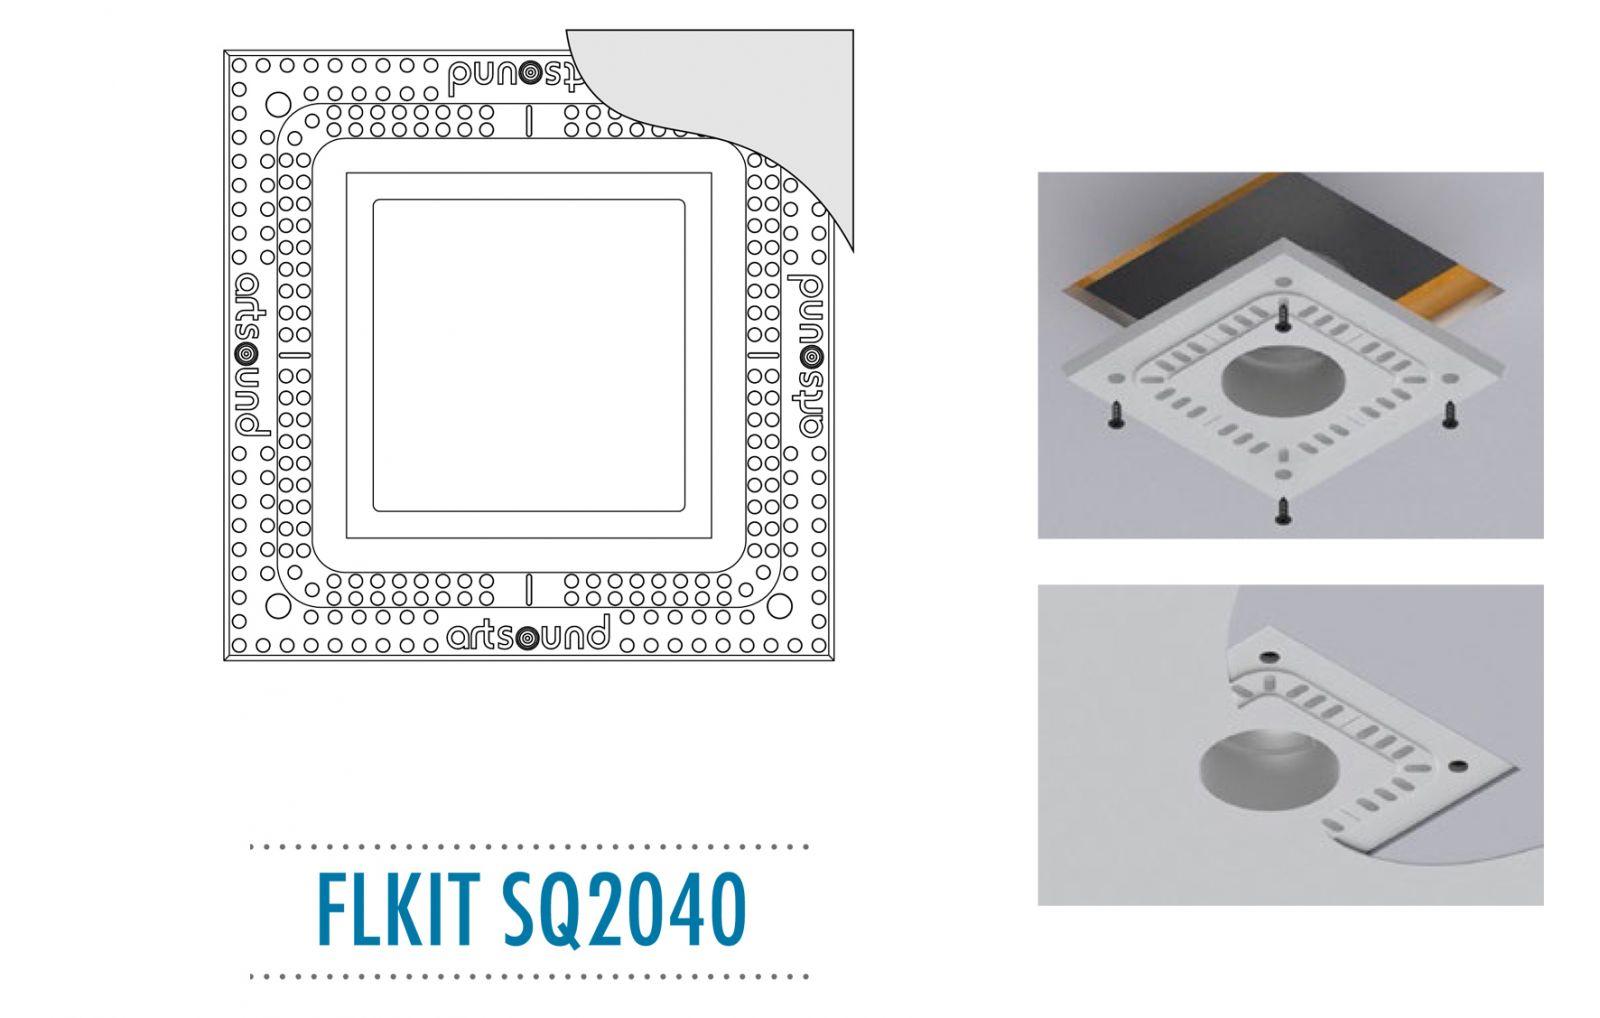 FLKIT SQ2040